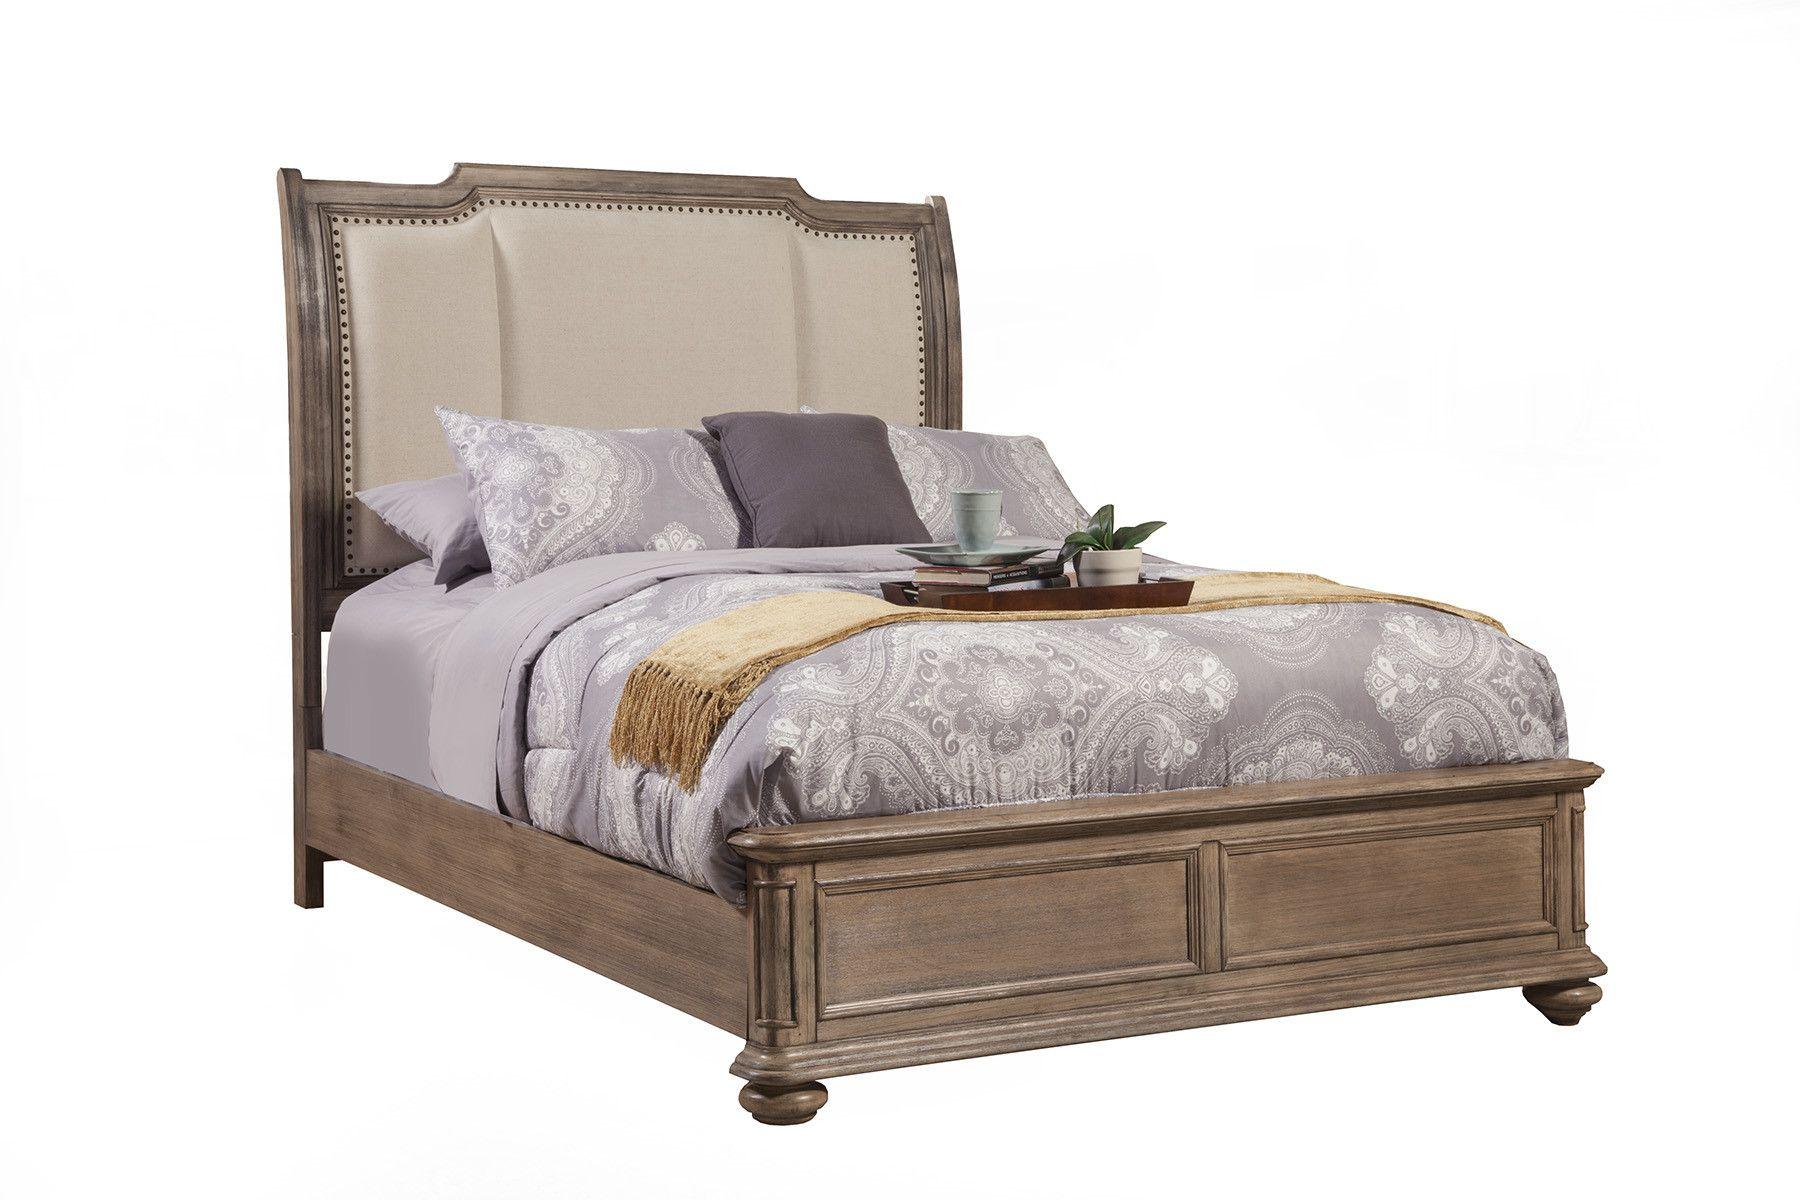 Alpine furniture melbourne panel bed reviews wayfair